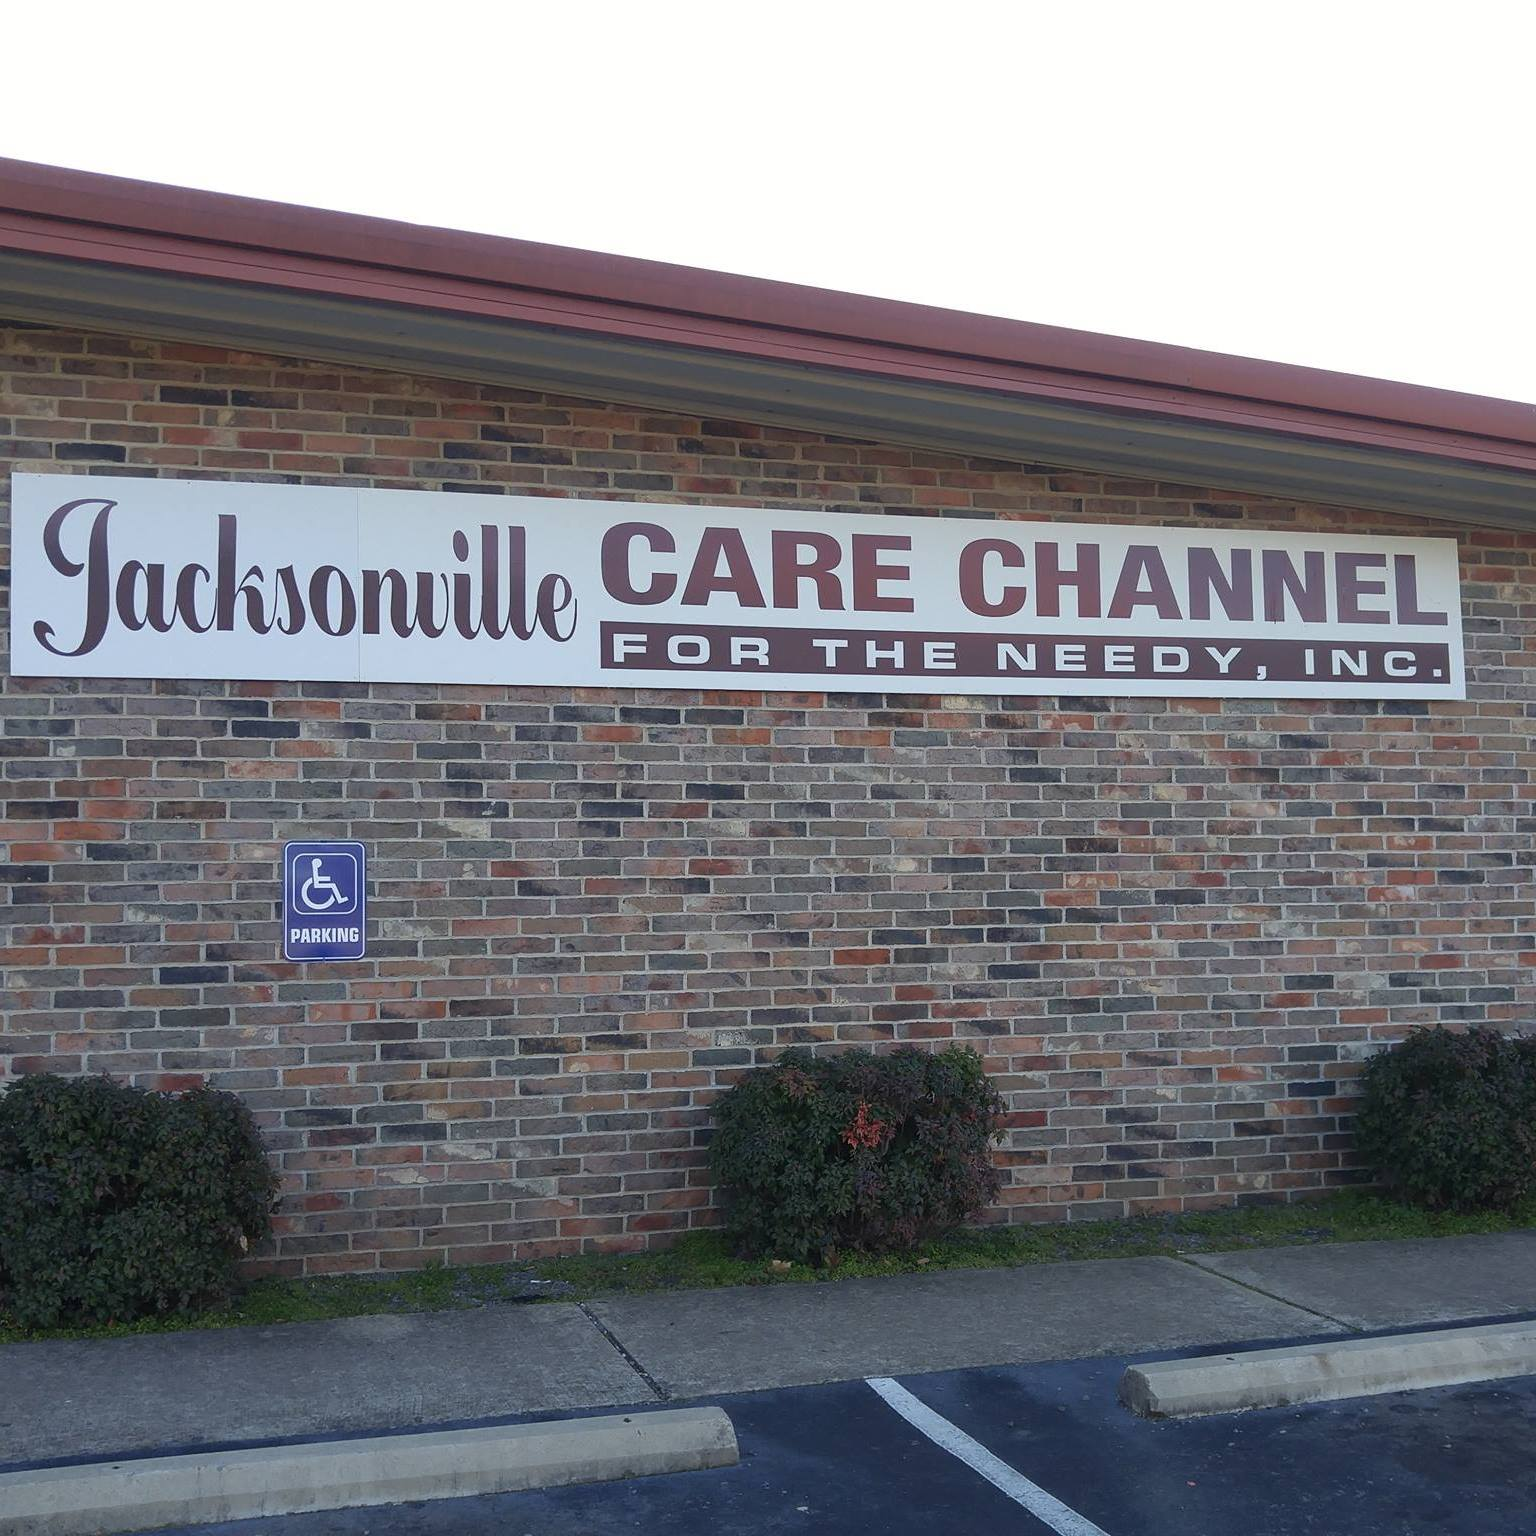 Jacksonville Care Channel